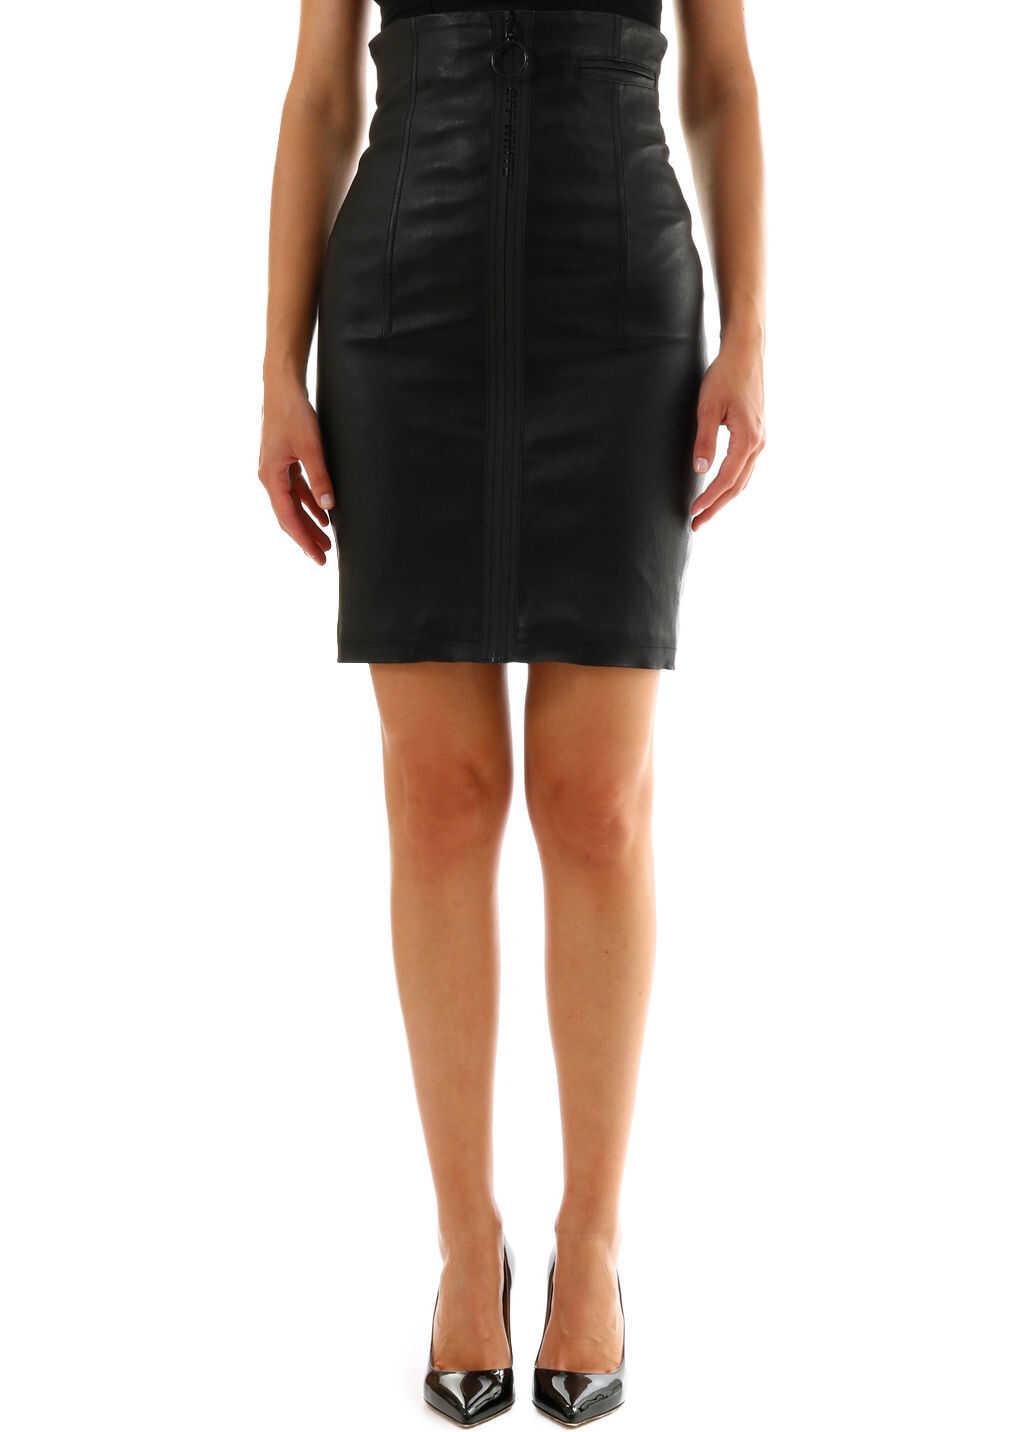 Off-White Leather Skirt Black